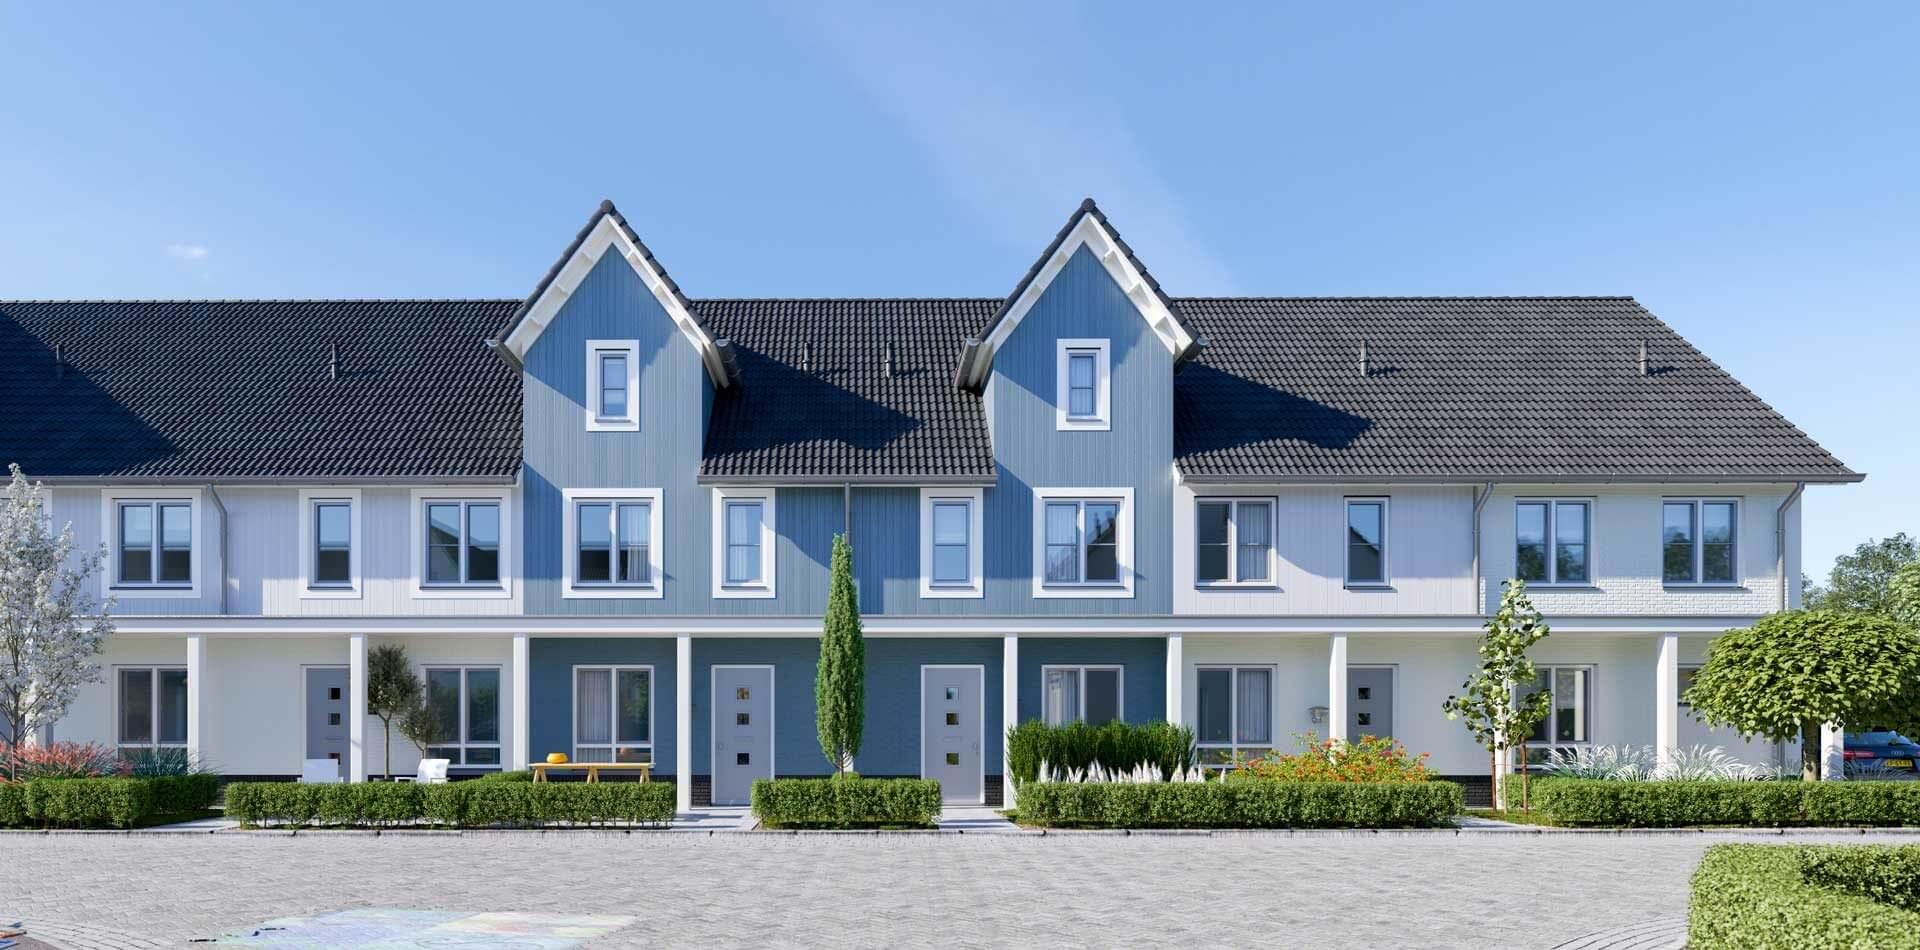 Zuiderpark-Tilburg-Werk-yoreM-nieuwbouw-tilburg